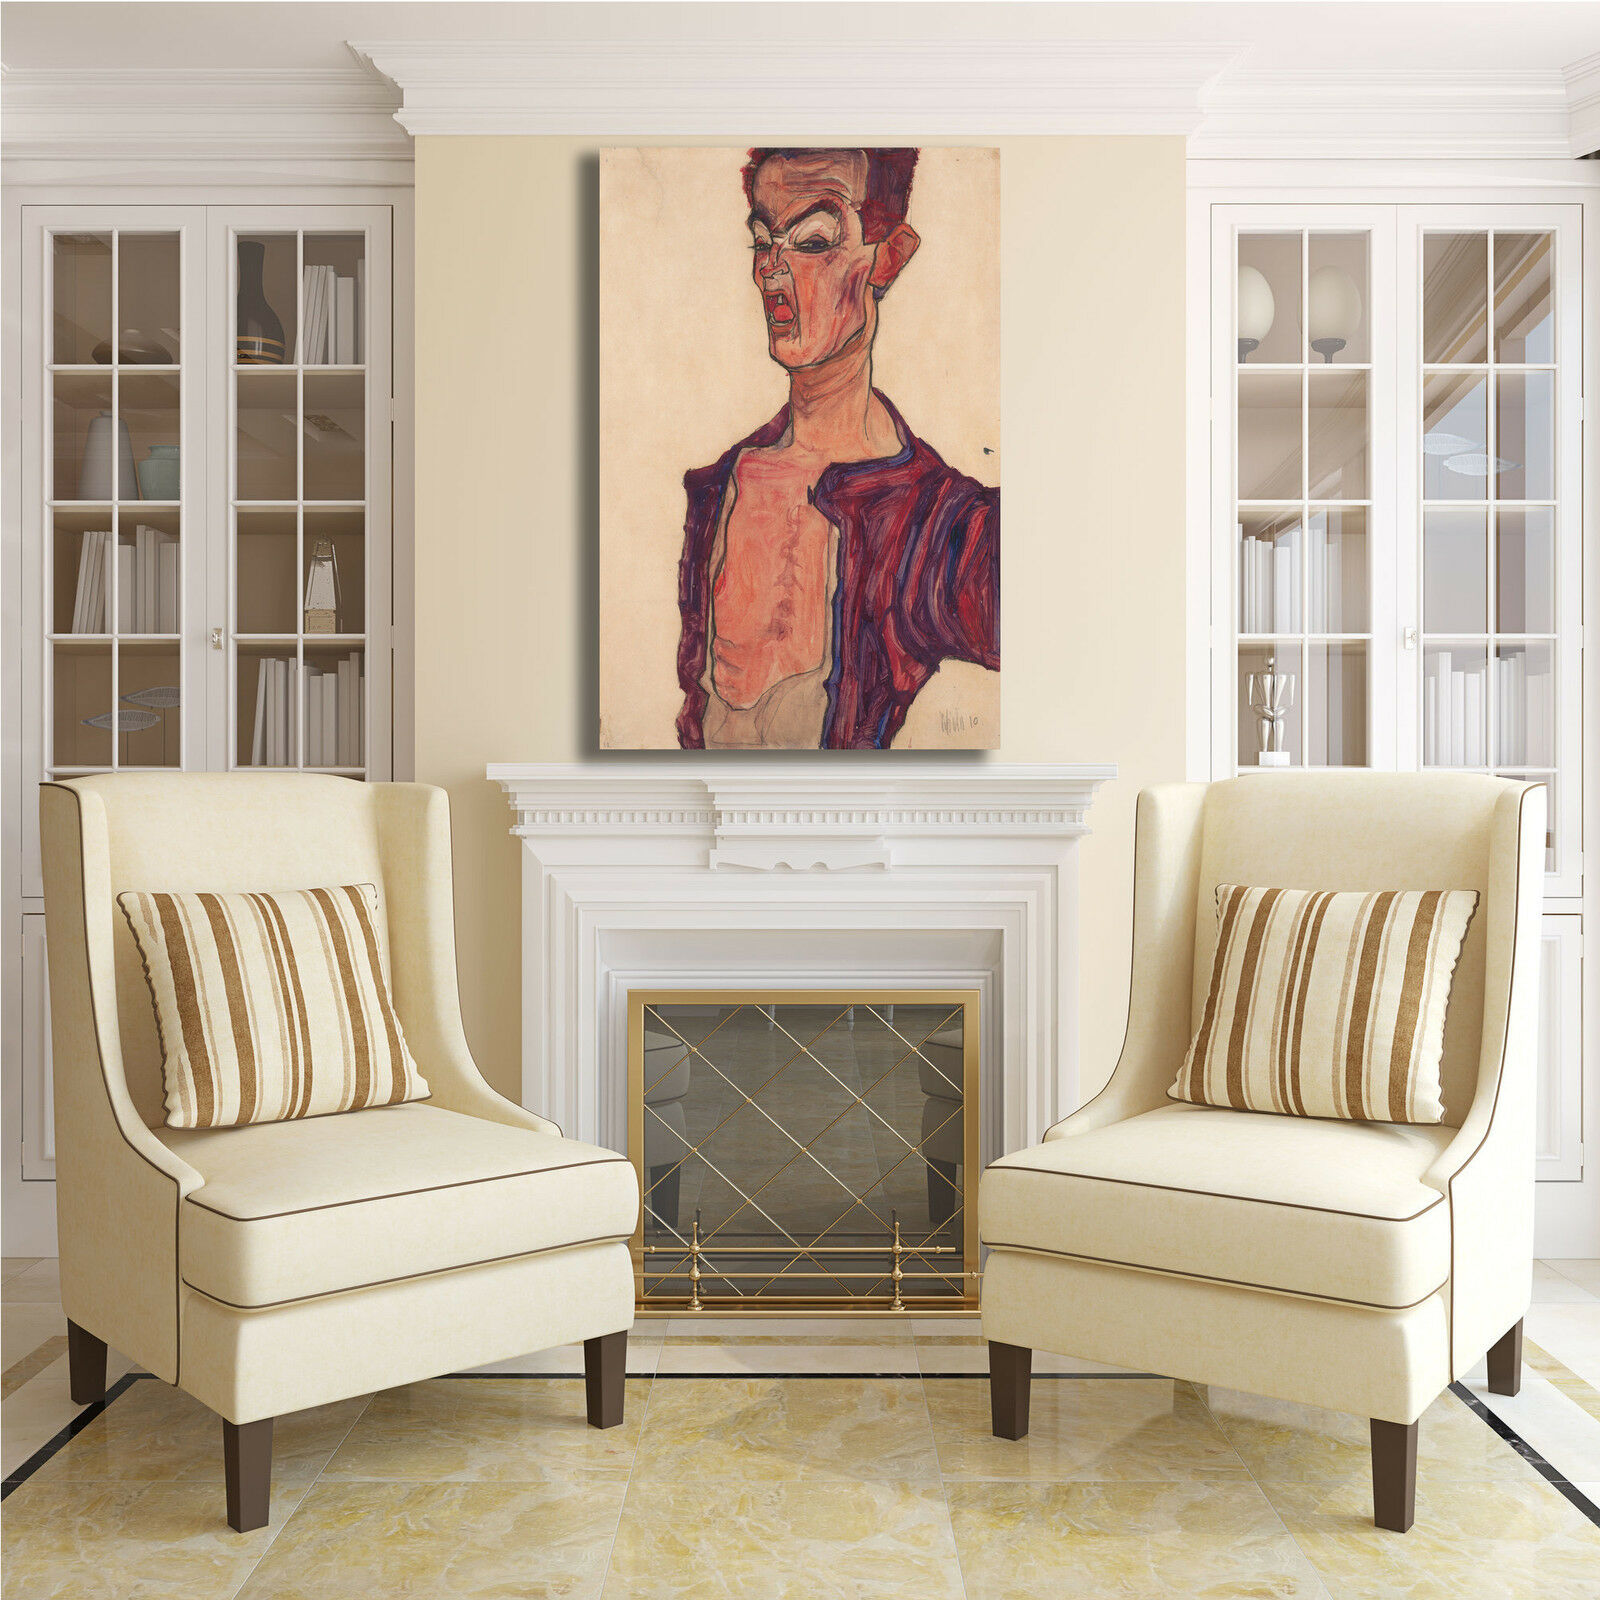 Schiele autoritratto smorfie quadro stampa dipinto tela dipinto stampa telaio arRouge o casa 97d8f2